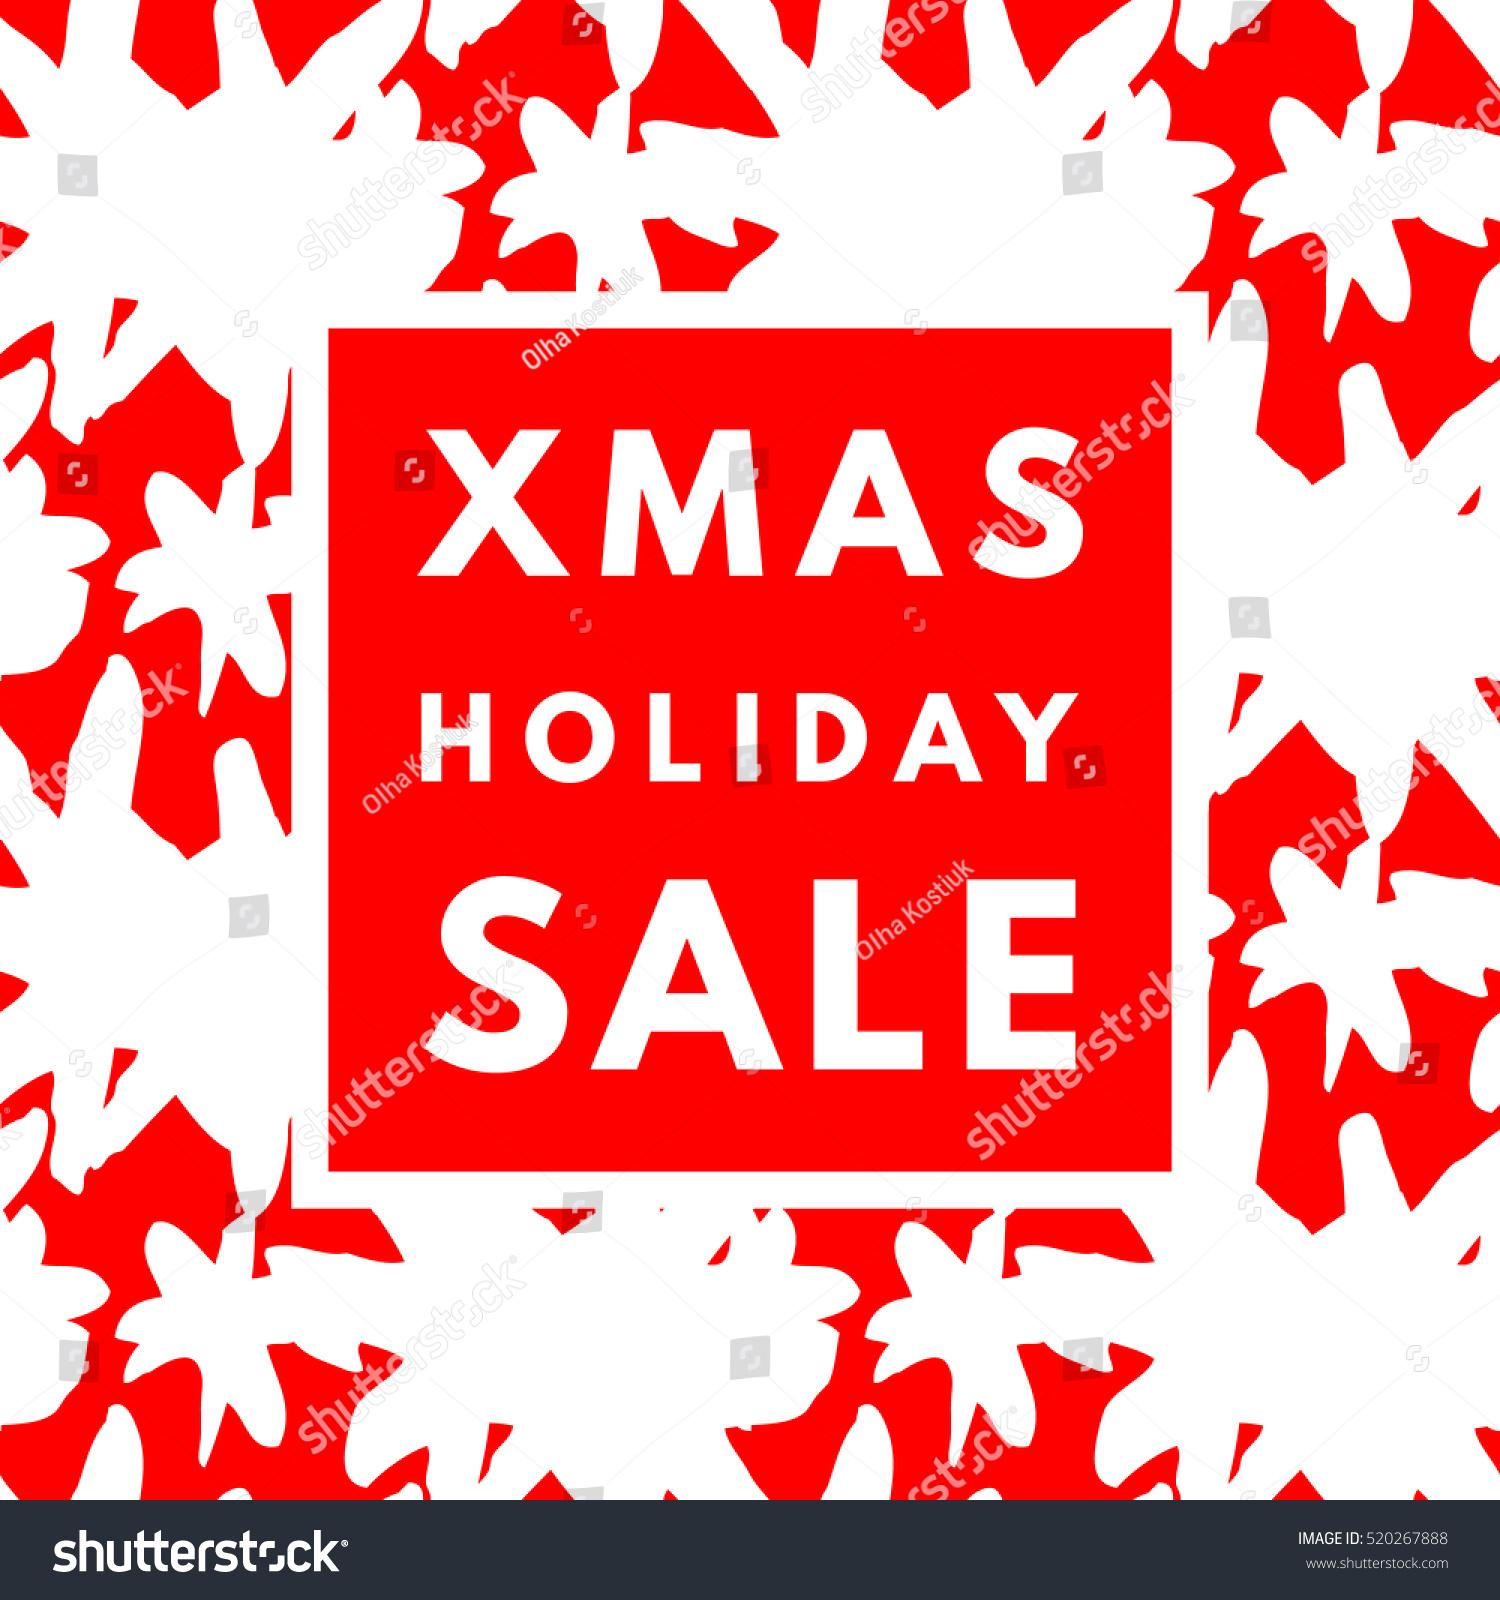 Christmas Holiday Sale Poster Minimalism Trendy Stock ...